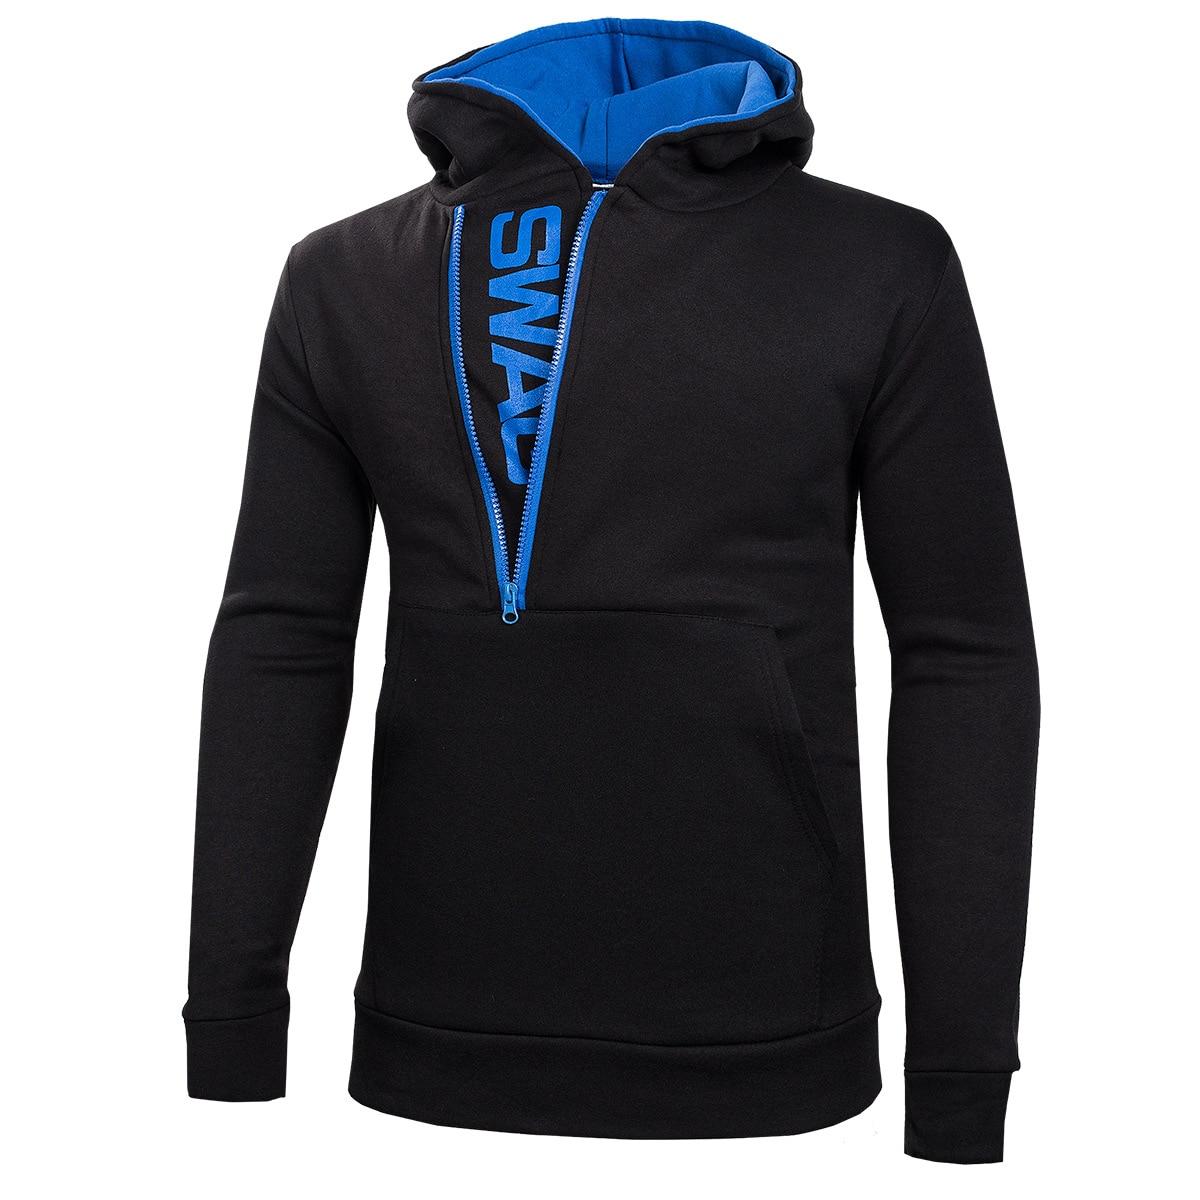 Men's Sweatshirt Letter Side Zip Men's Hooded Jacket Mens Black Hoodies Clothes 2019 Plus Size XXXL 4XL 5XL 6XL